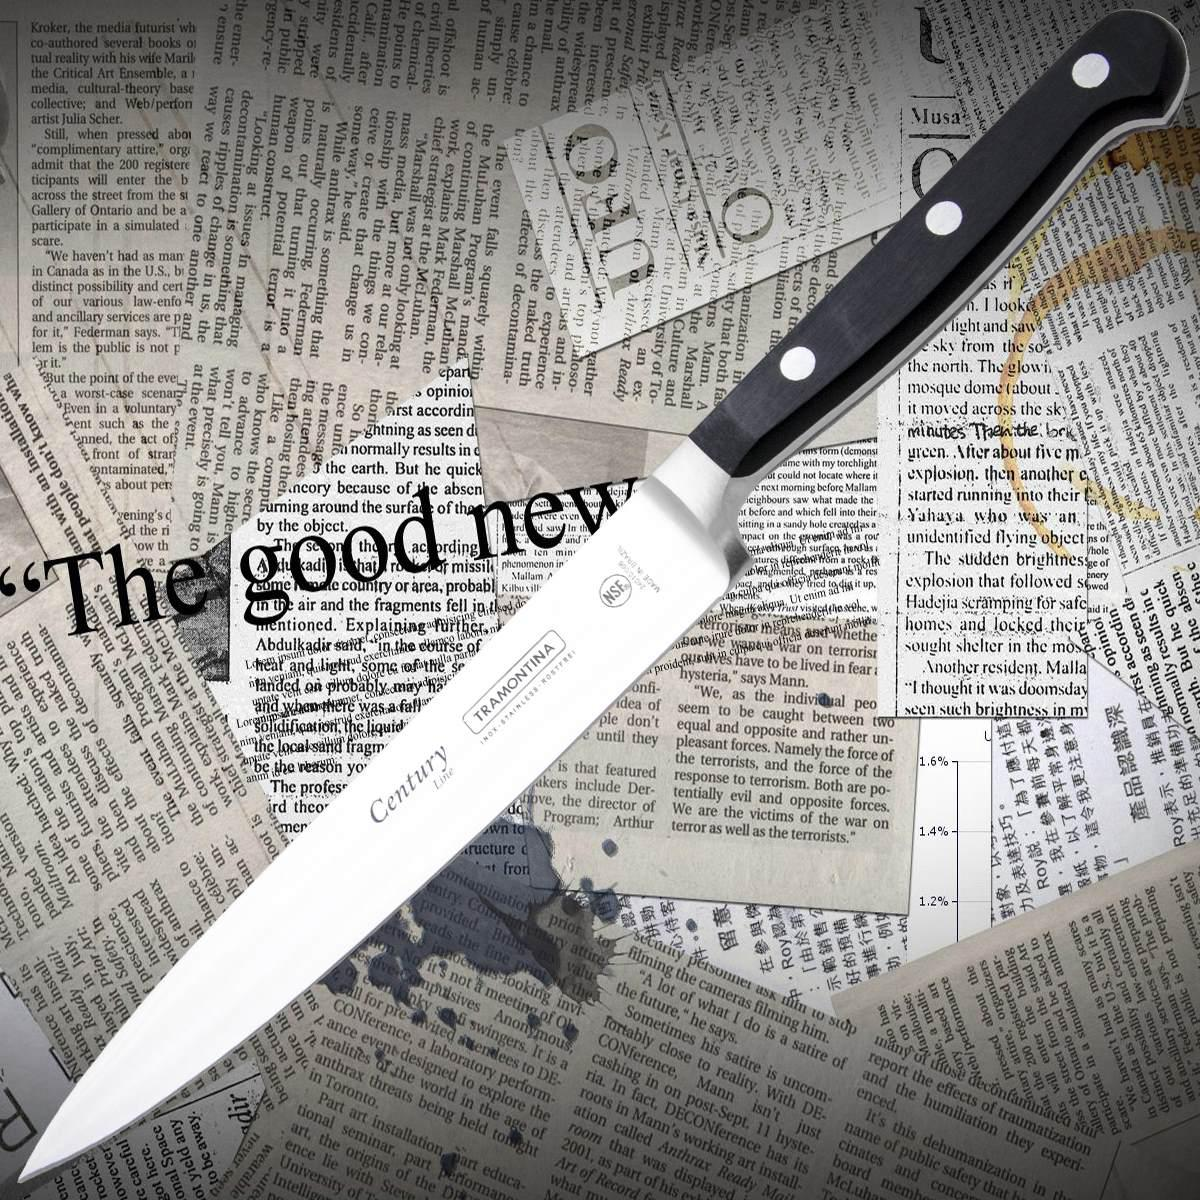 Нож кухонный Tramontina 24010/106 CENTURY нарезной